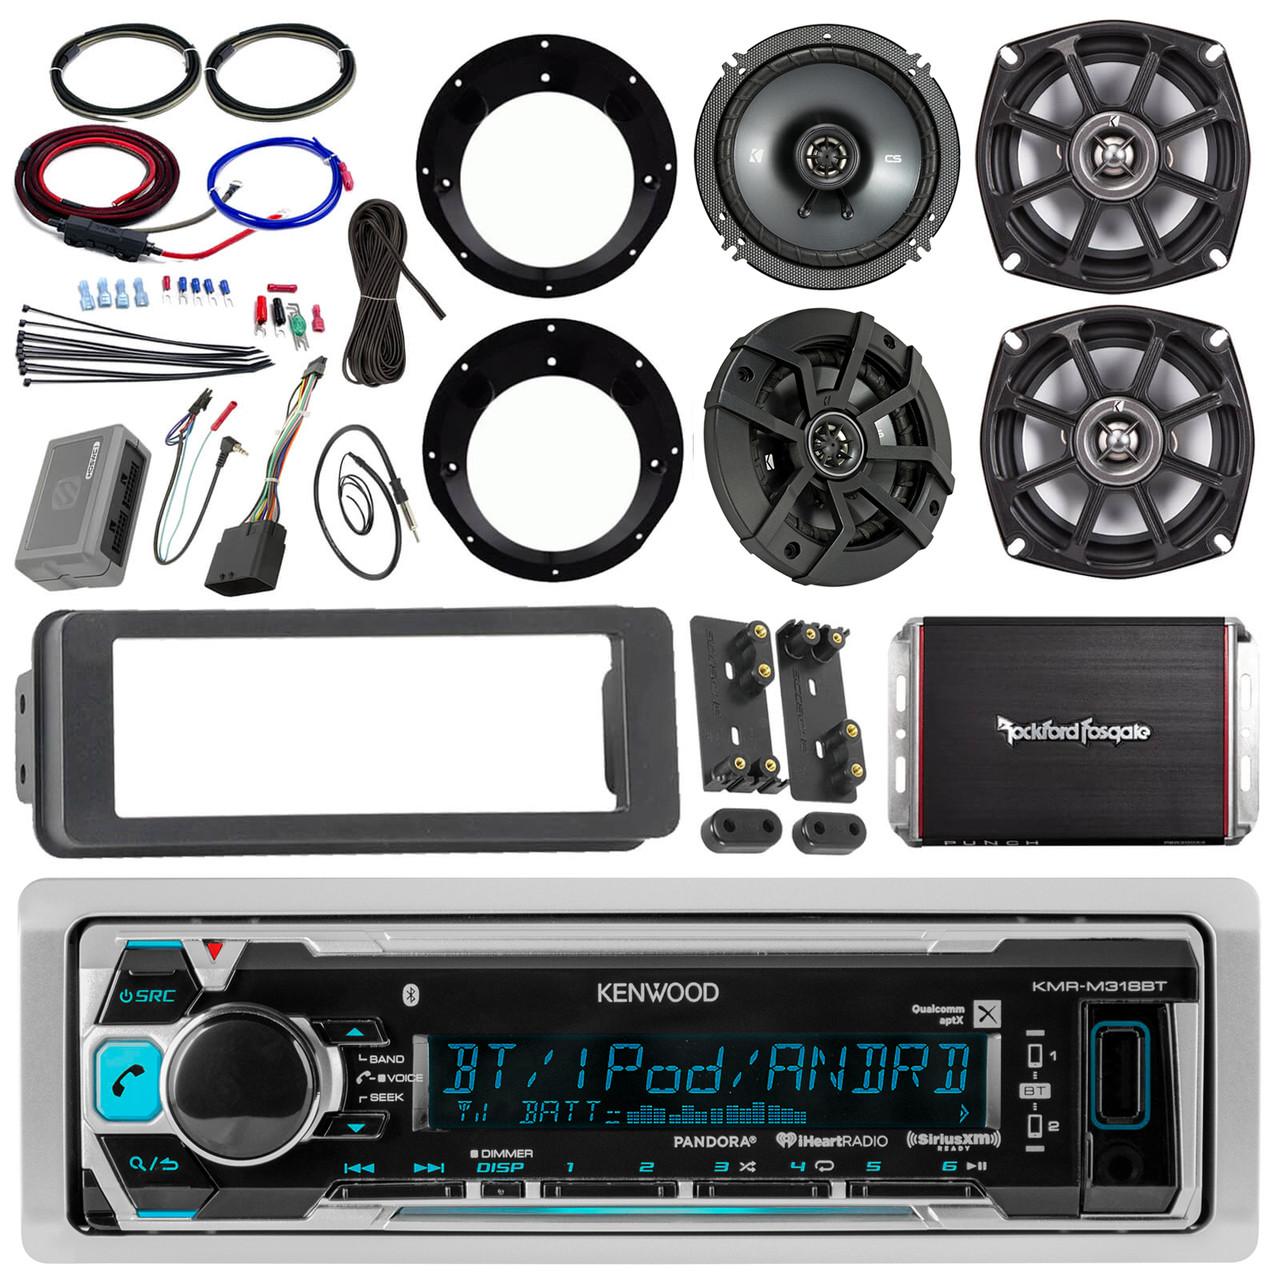 hight resolution of kenwood kmrm318bt stereo receiver bundle 2x kicker 6 5 speaker 2 wiring diagram moreover 2 channel 4 ohm speakers wiring on 12 kenwood